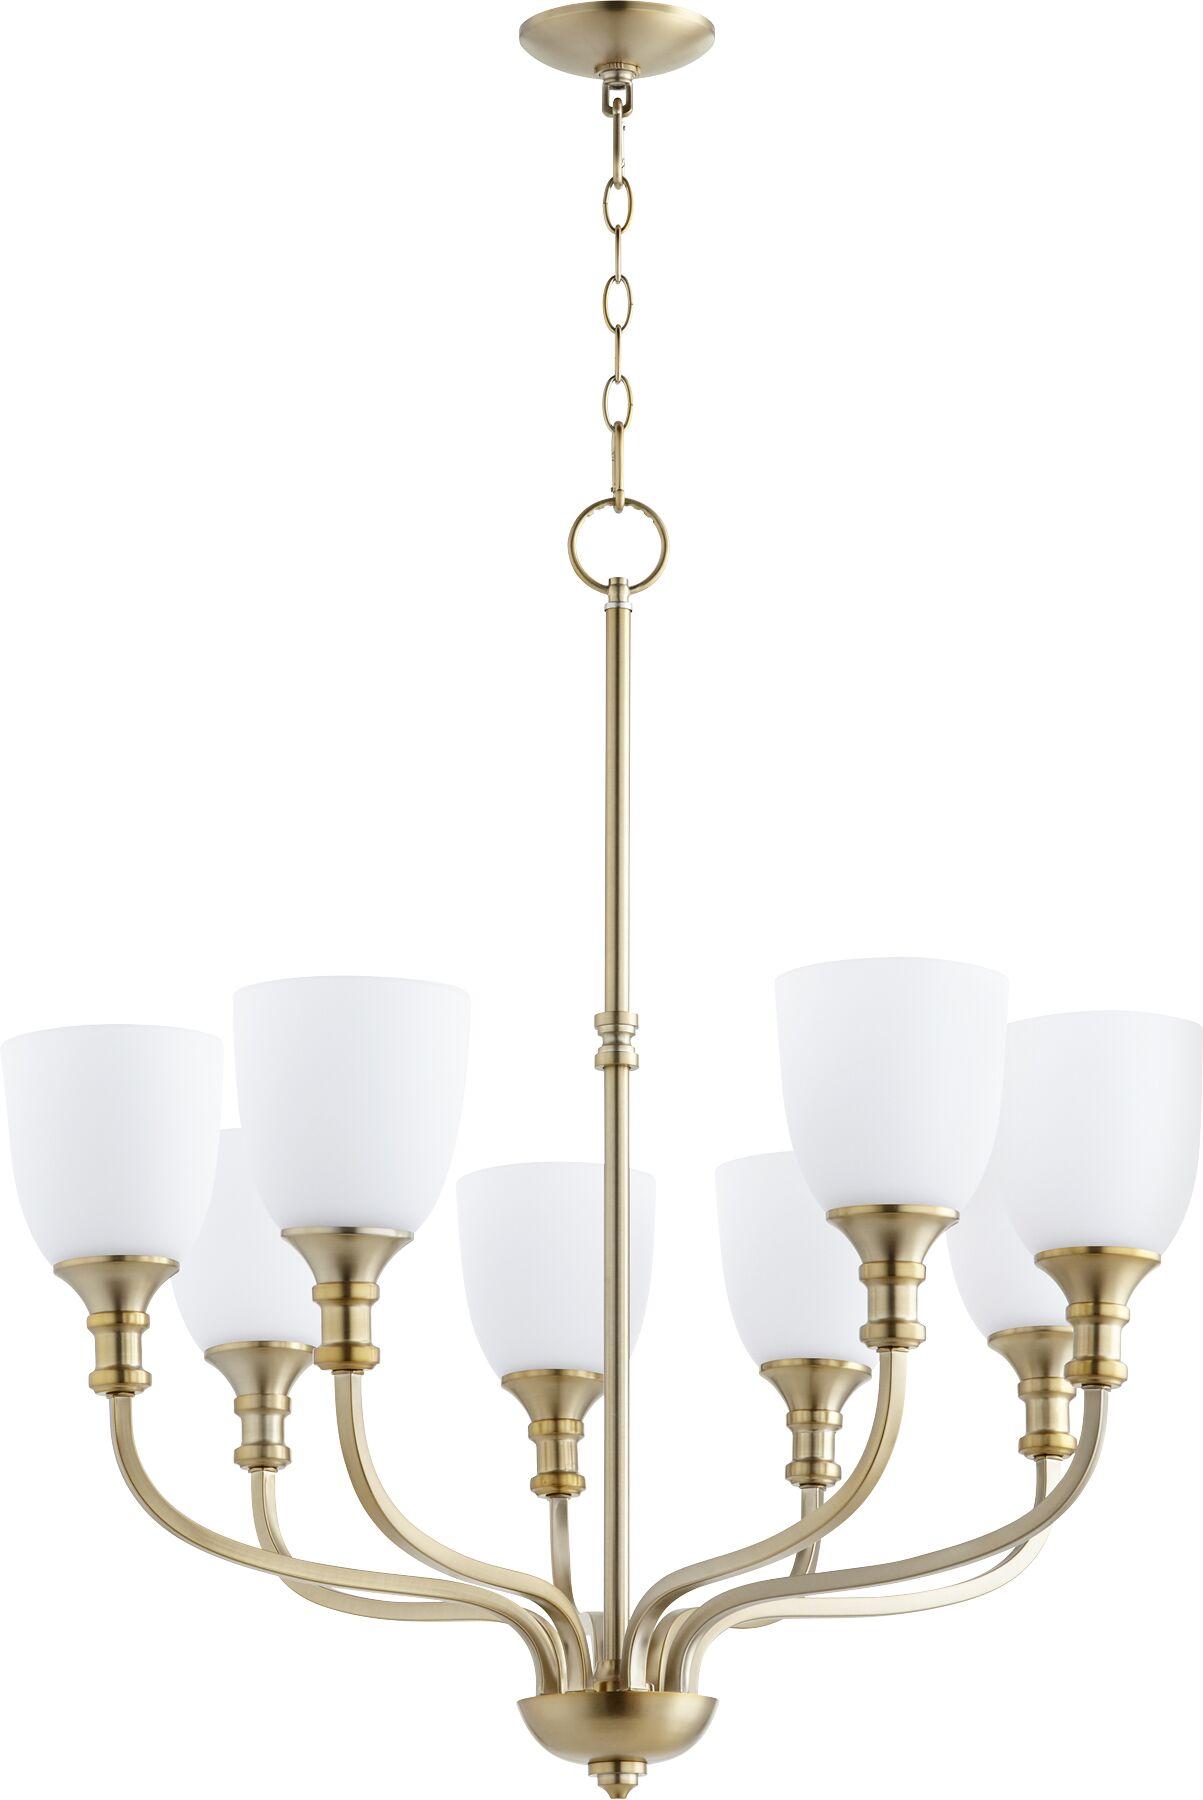 Falbo 8-Light Shaded Chandelier Finish: Aged Brass